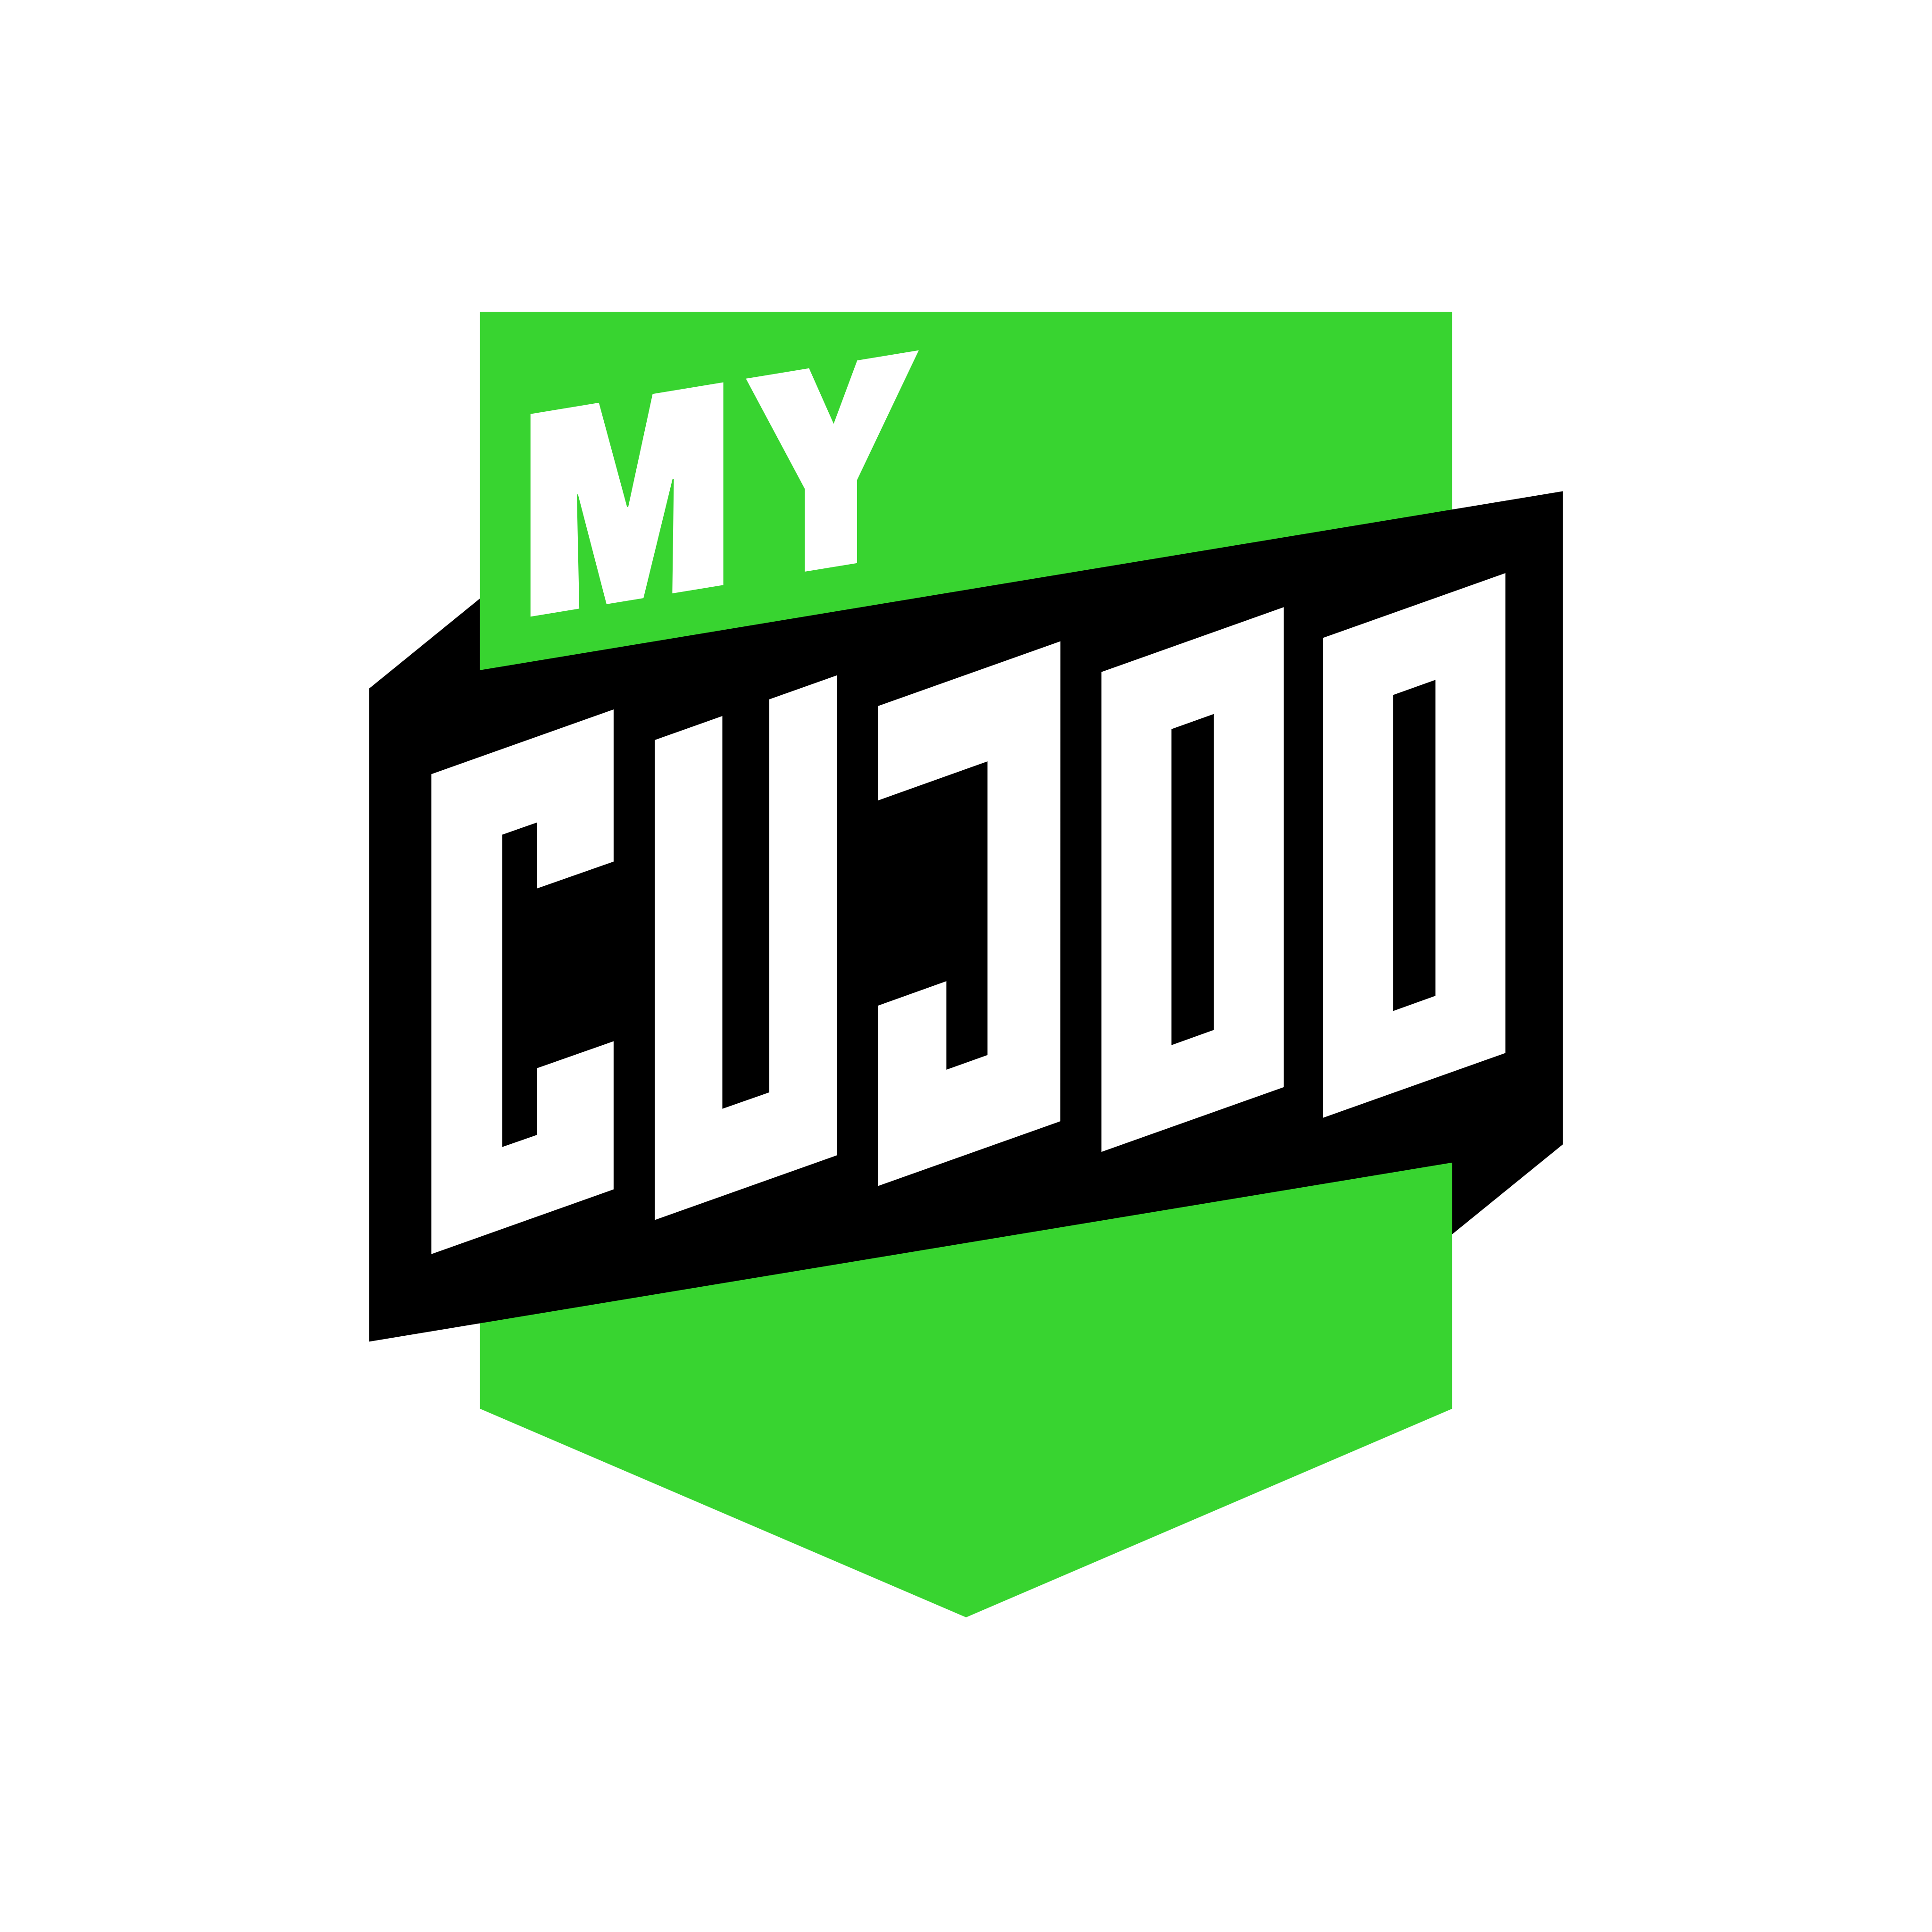 my cujoo logo 0 - My Cujoo Logo